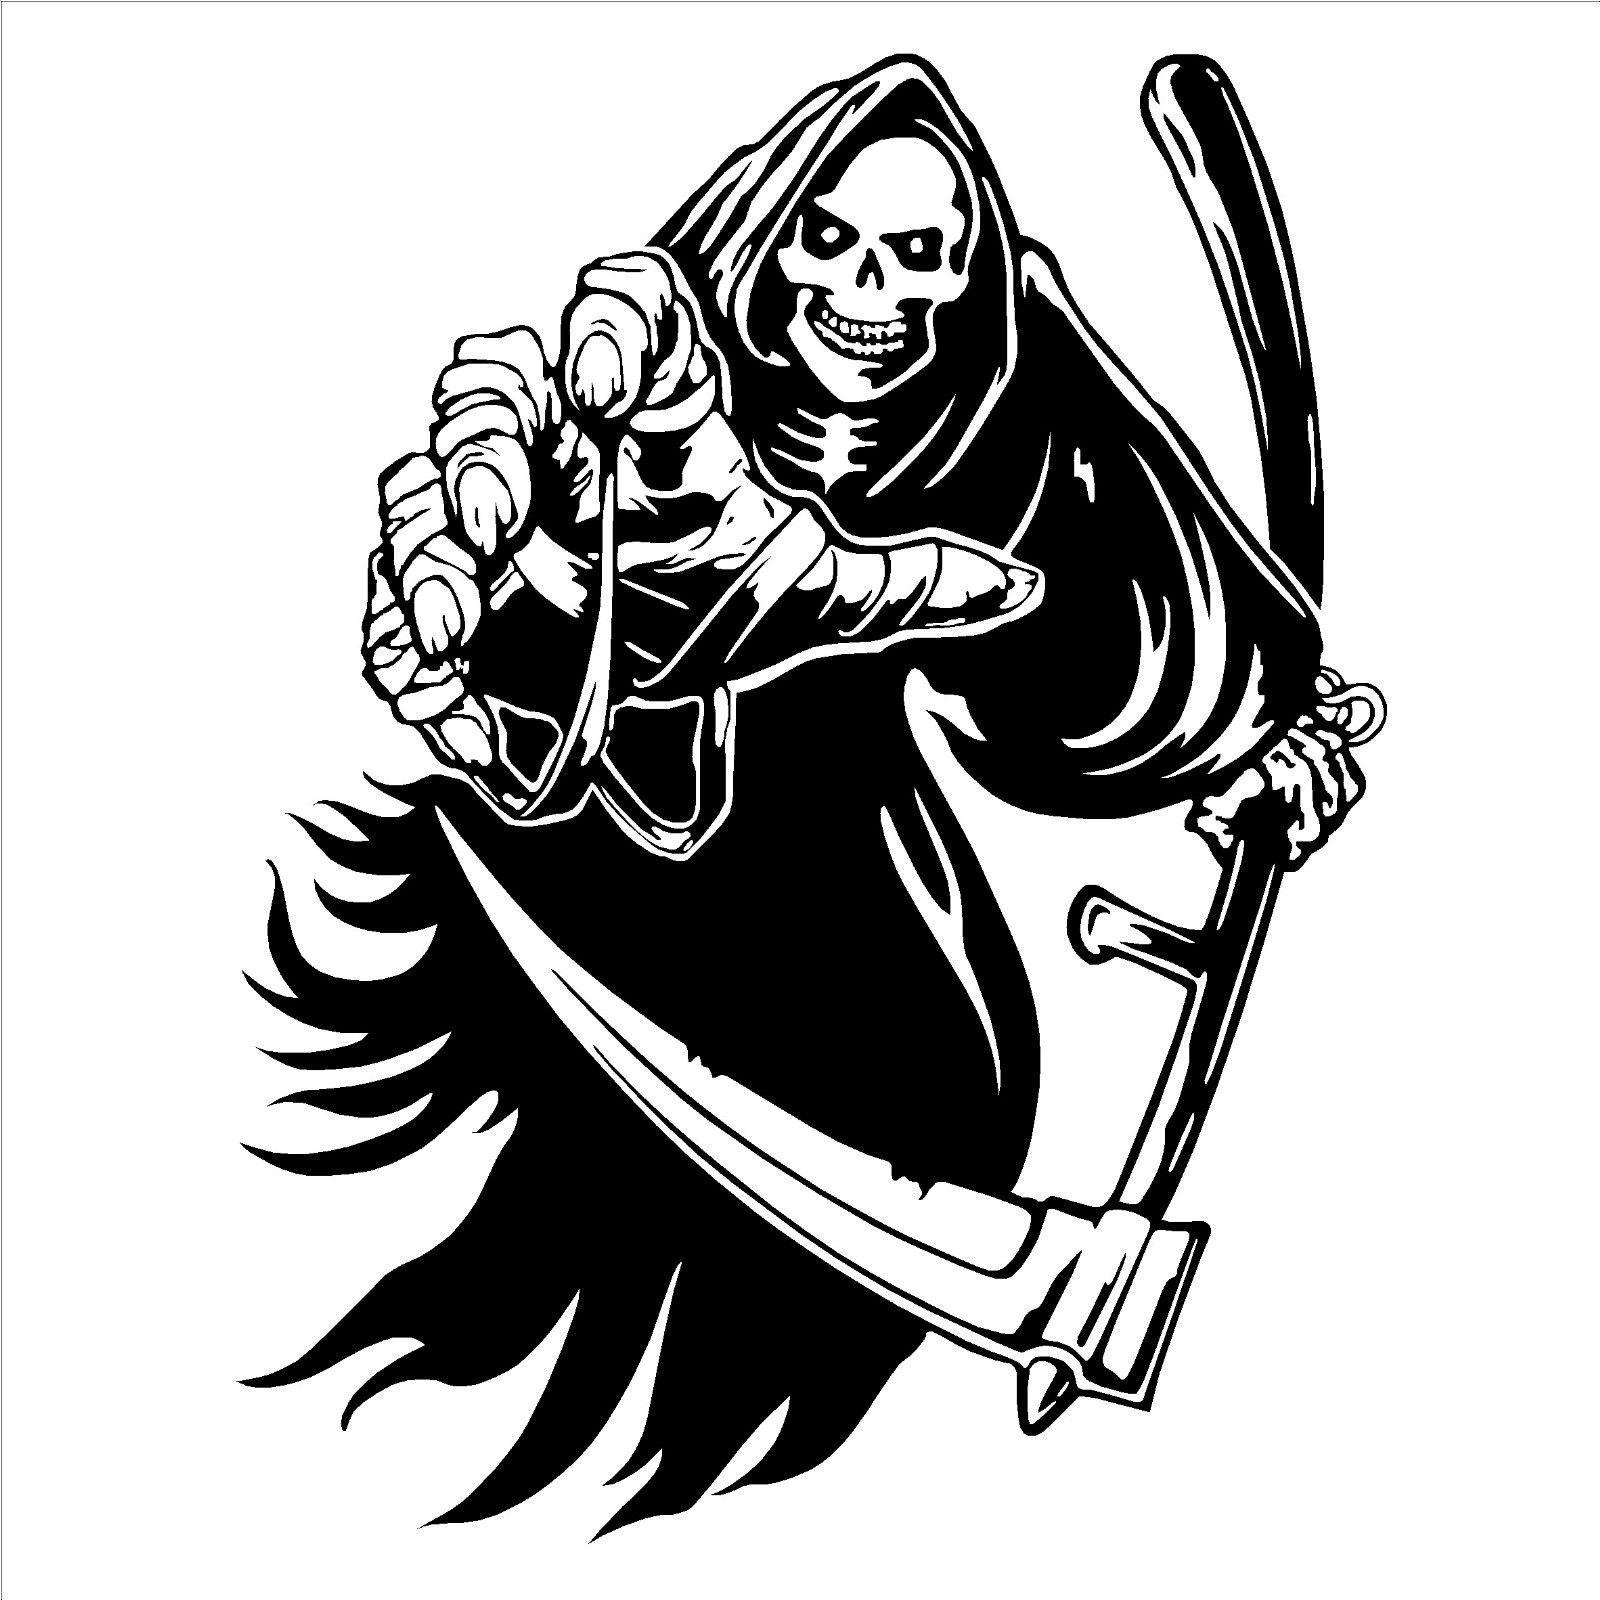 The Grim Reaper Death Skeleton Vinyl Wall Art Room Sticker